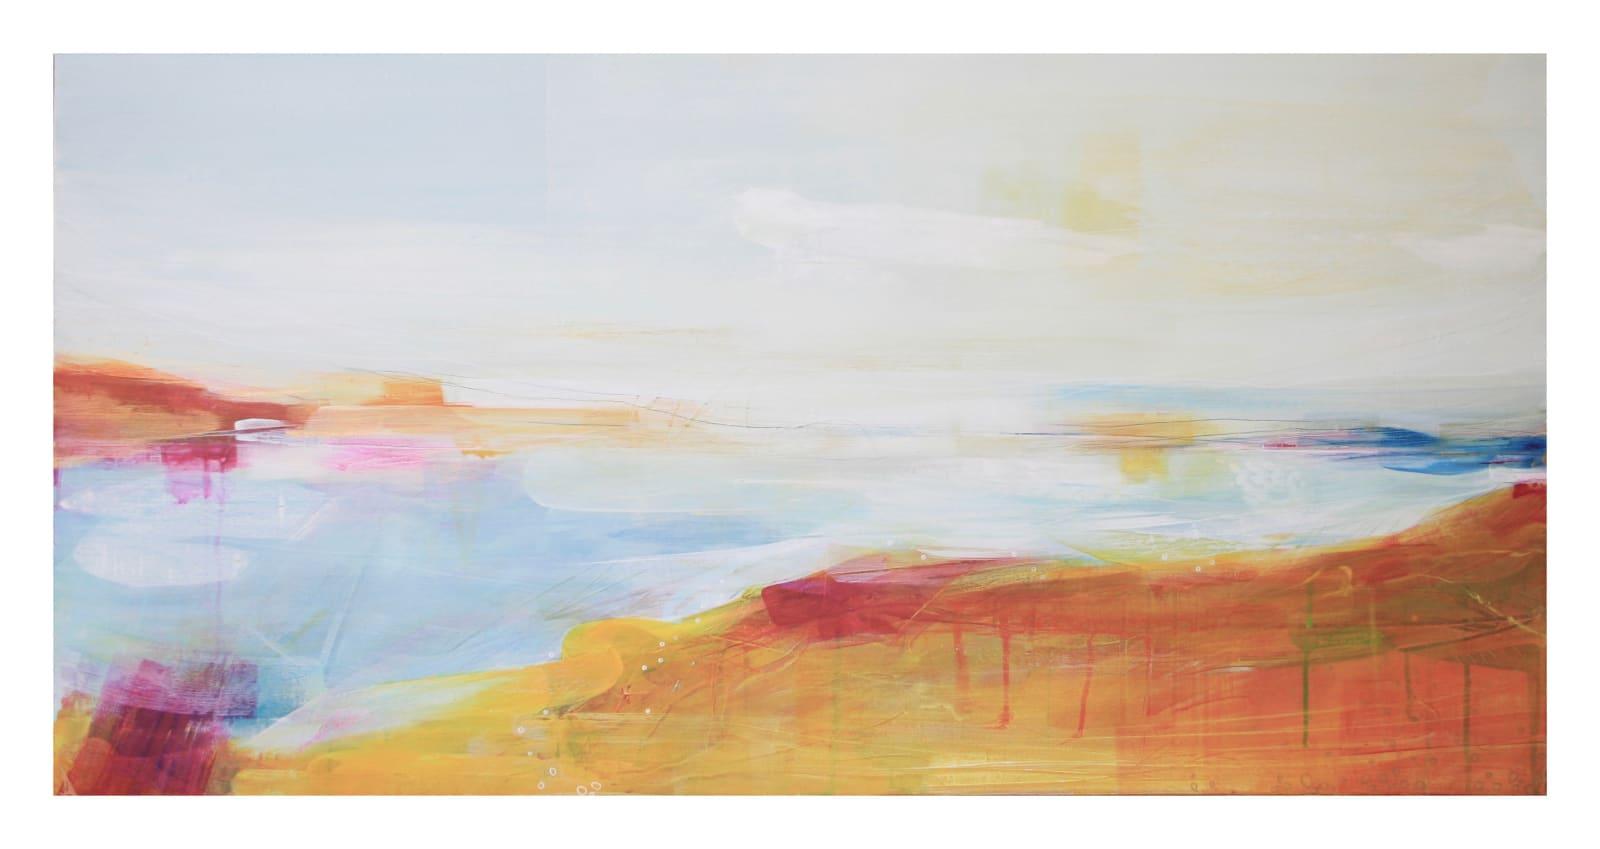 Victoria Wylie, Perpetual Dawn, Lunan Bay